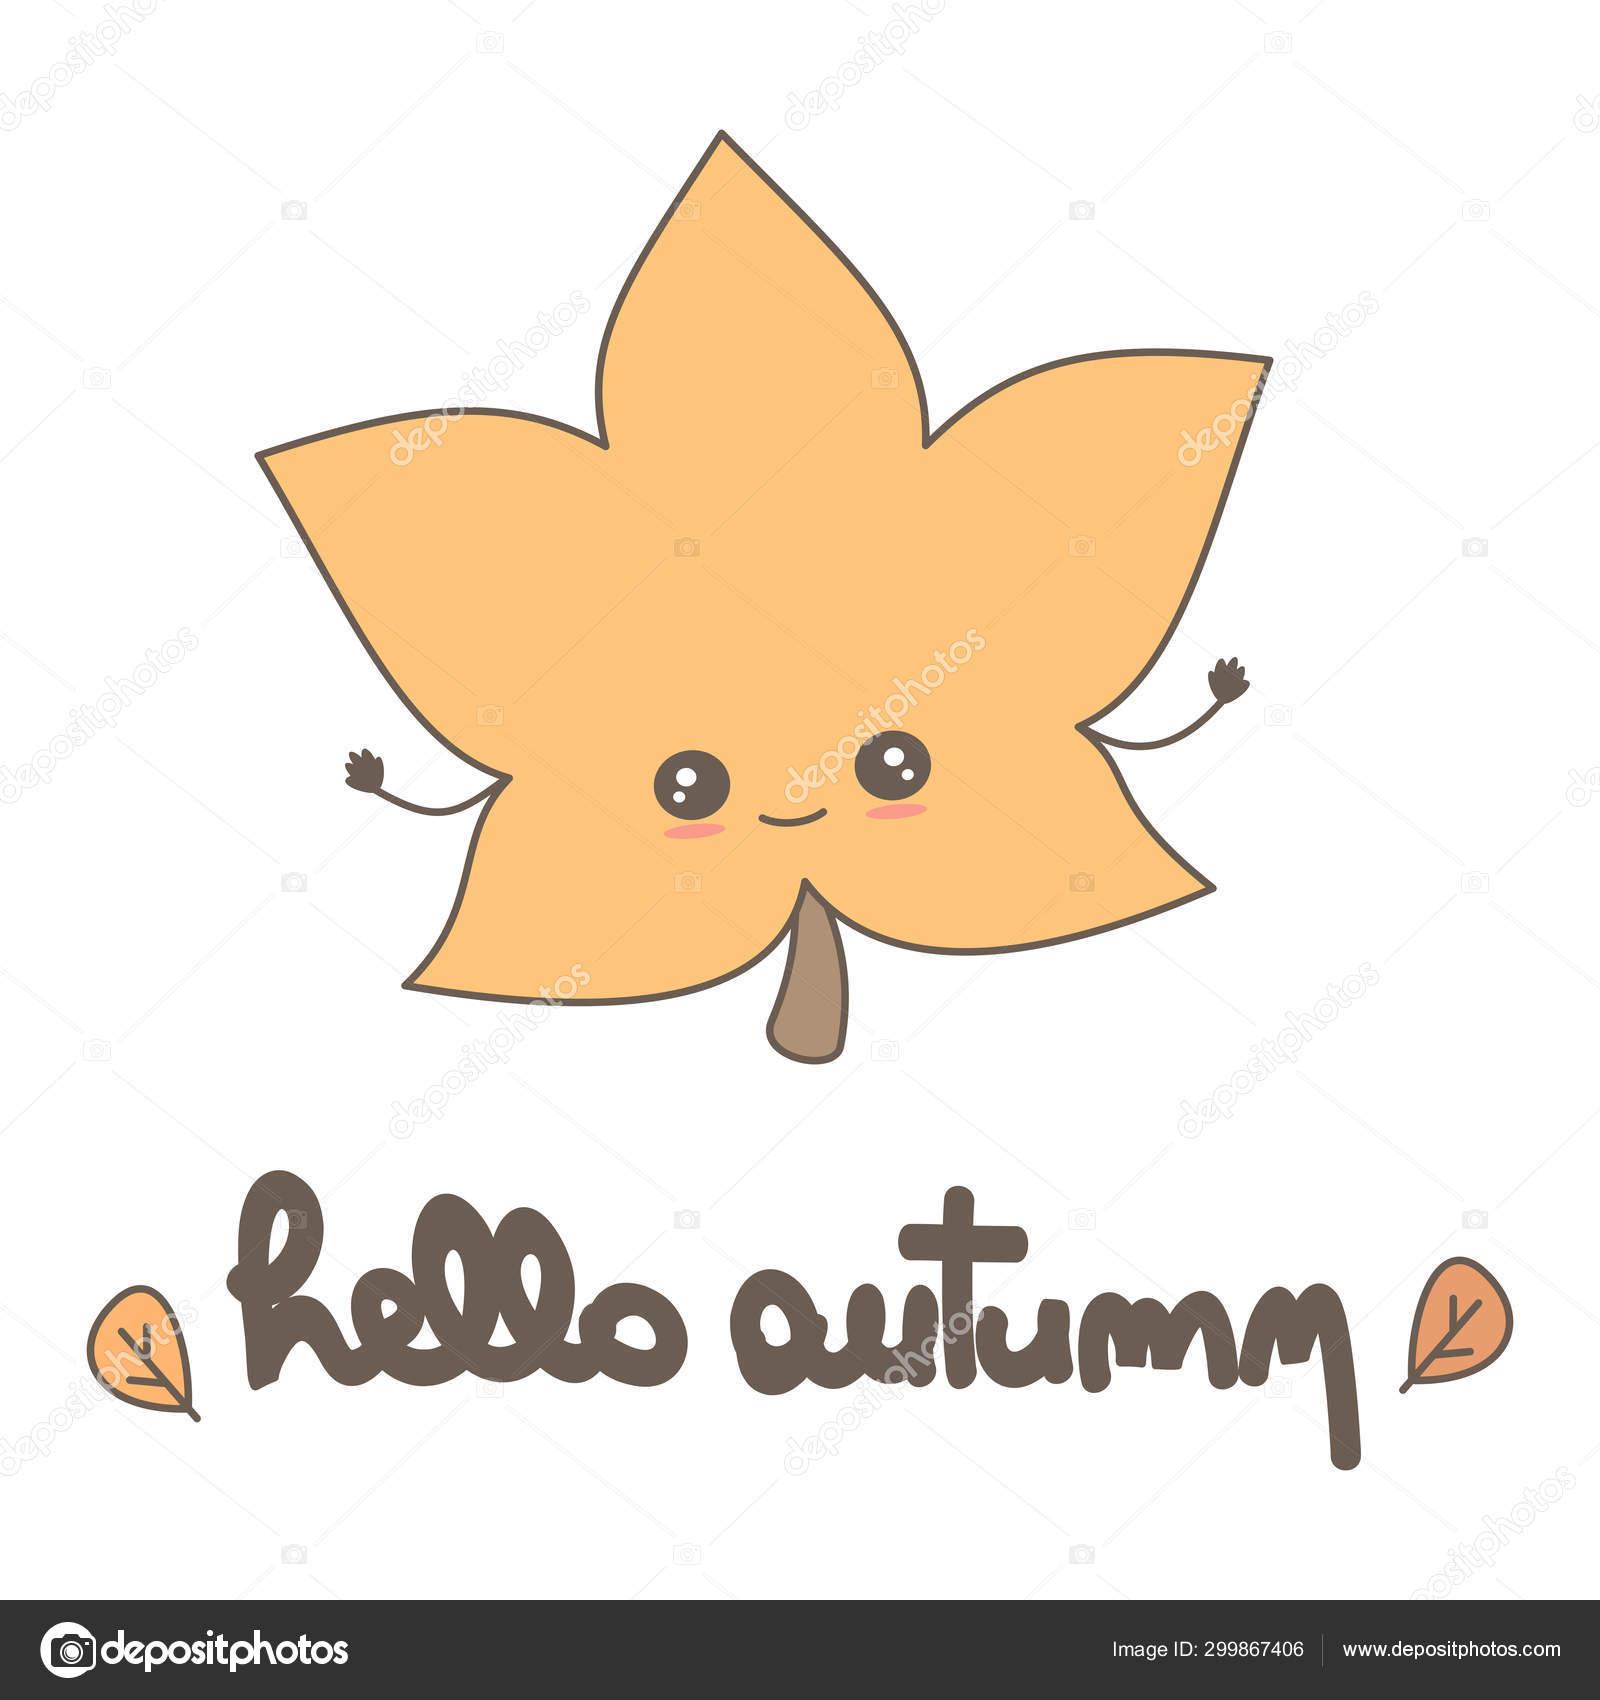 Cute Hand Drawn Lettering Hello Autumn Calligraphy Vector Card Fall Stock Vector C Alicev1978 299867406